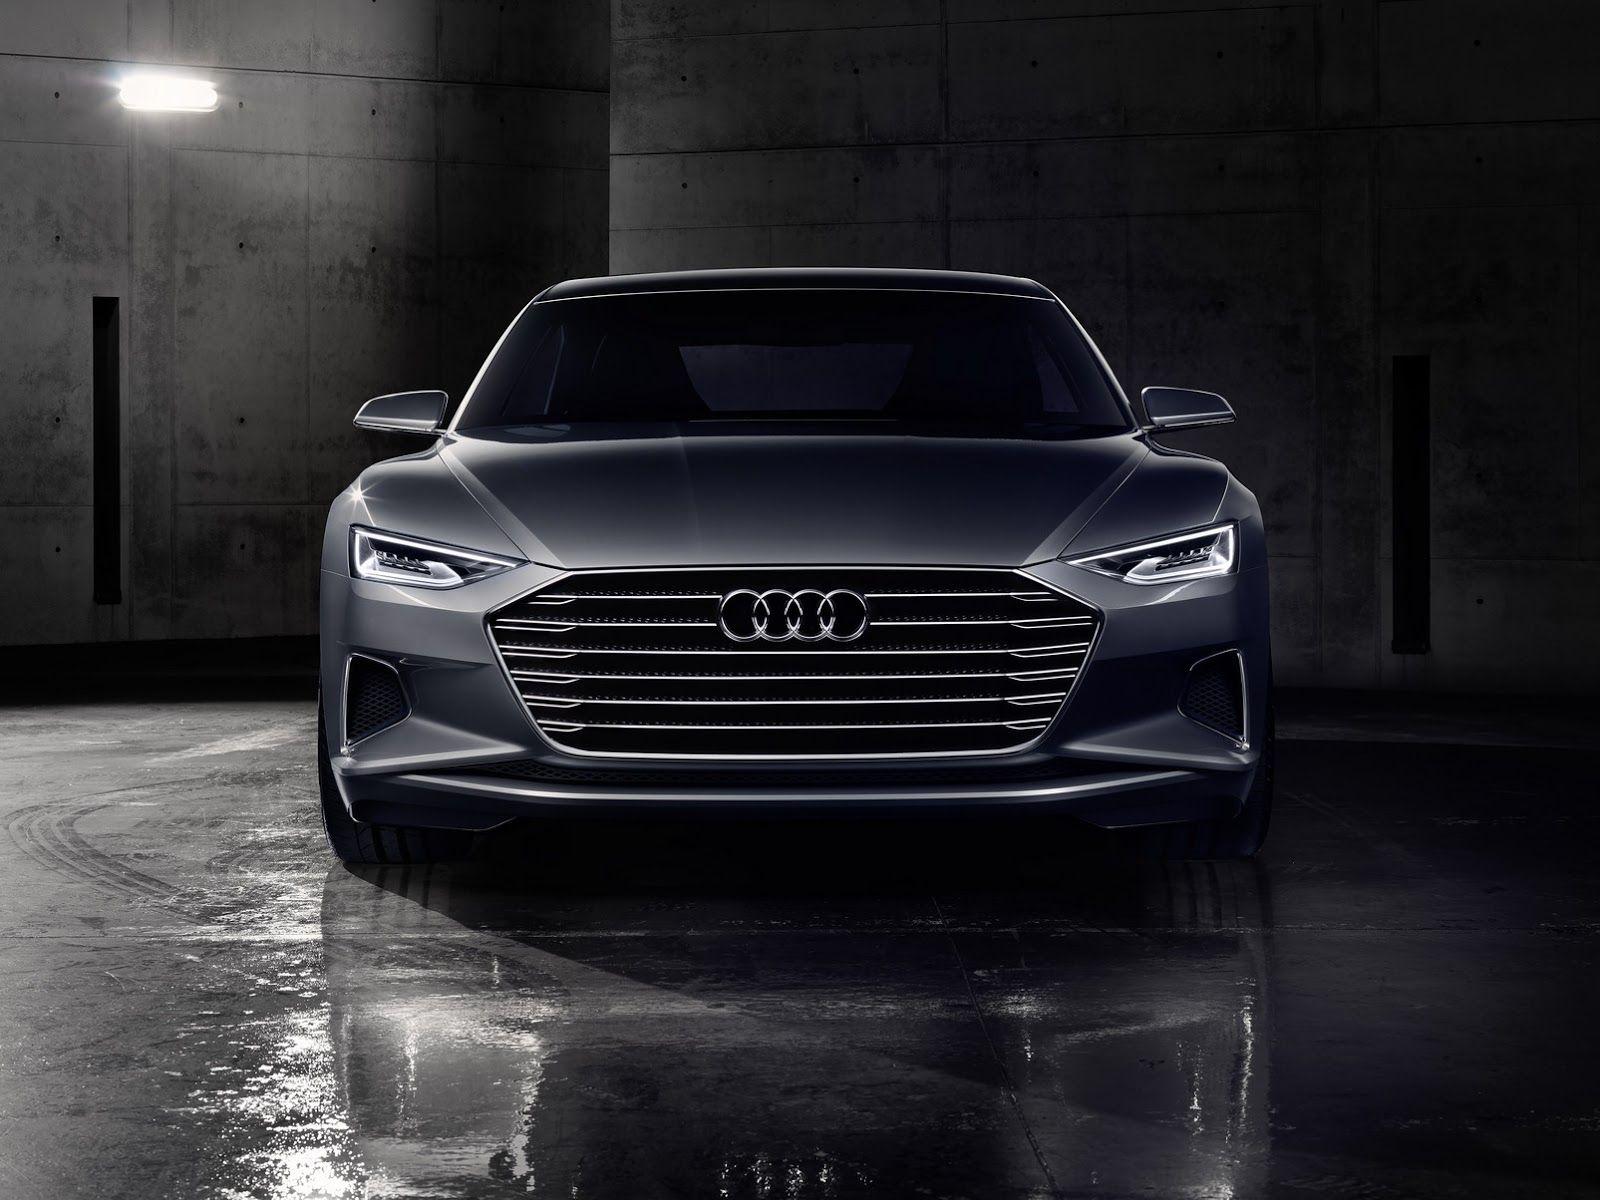 2017 Audi S6  Review Specs Release Date  httpnewautocarhq